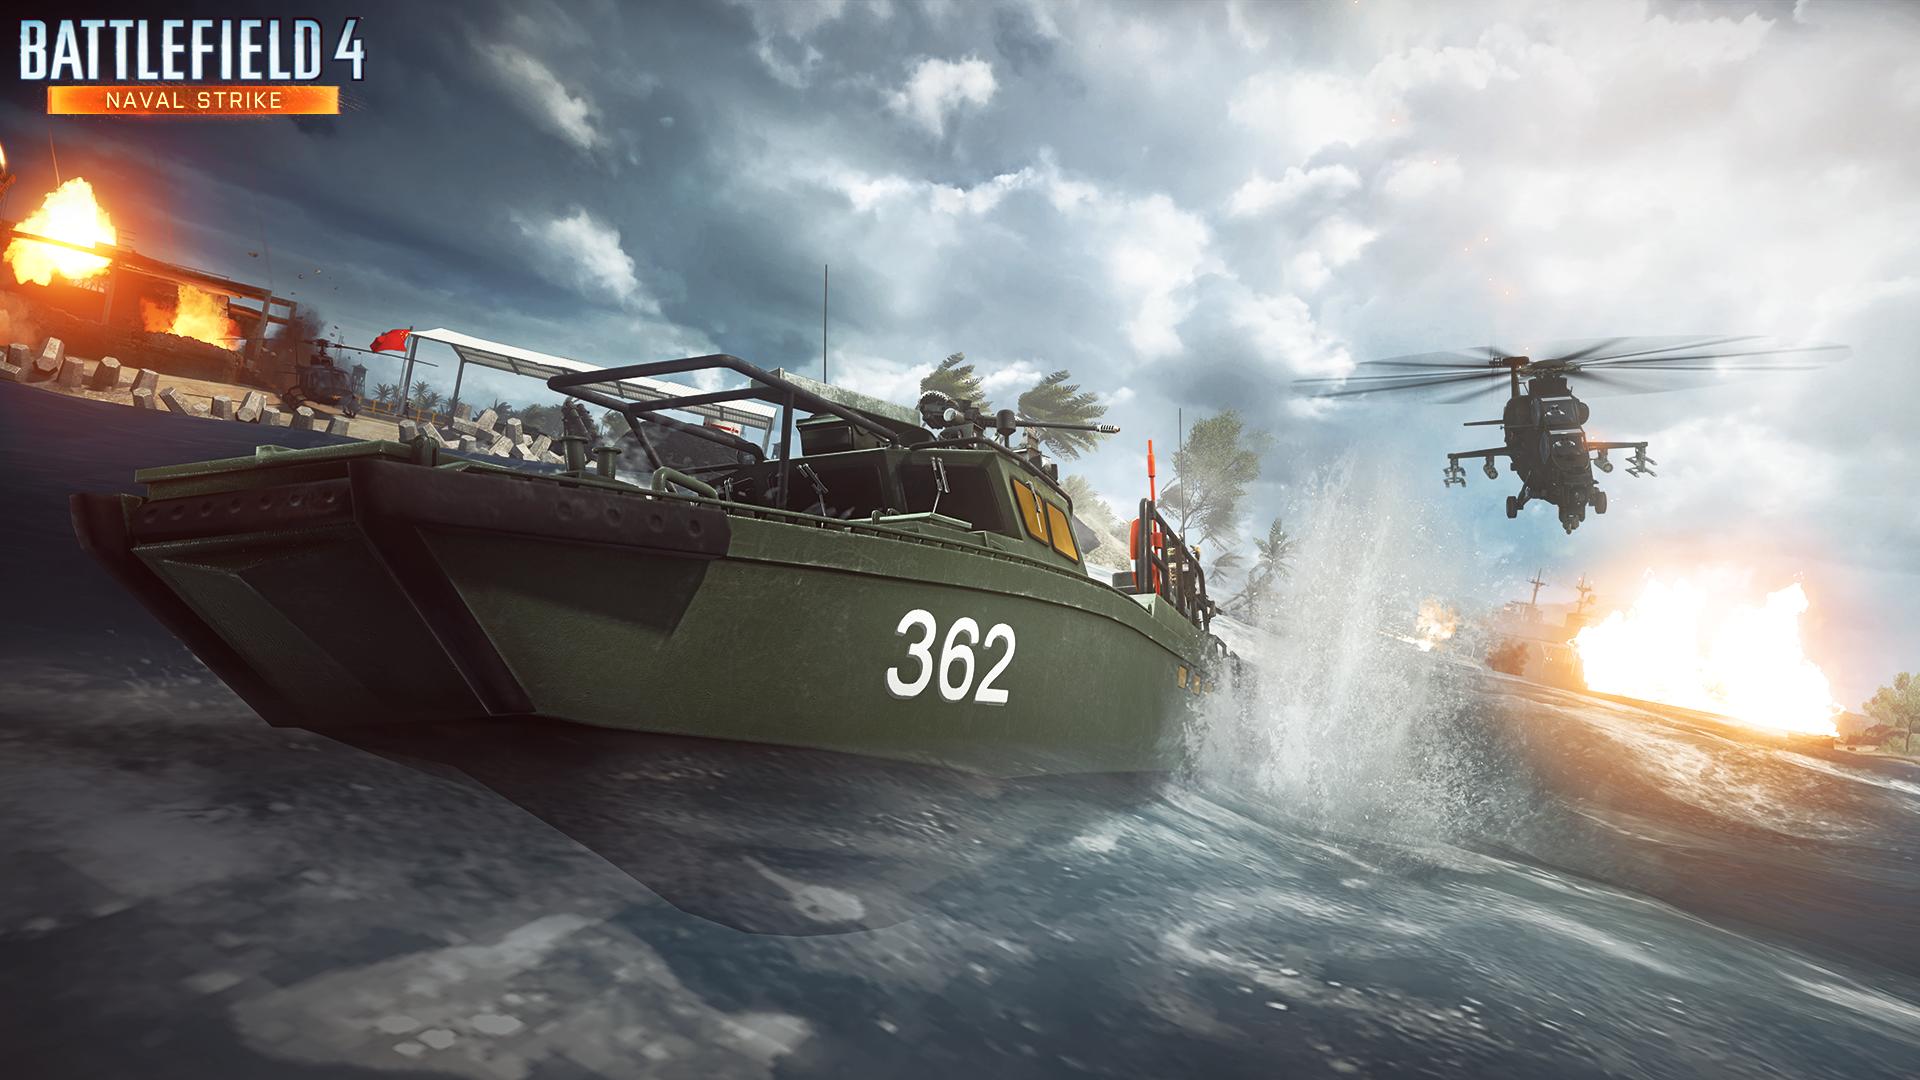 Battlefield 4 gets 'high-performance' servers to address rubber-banding